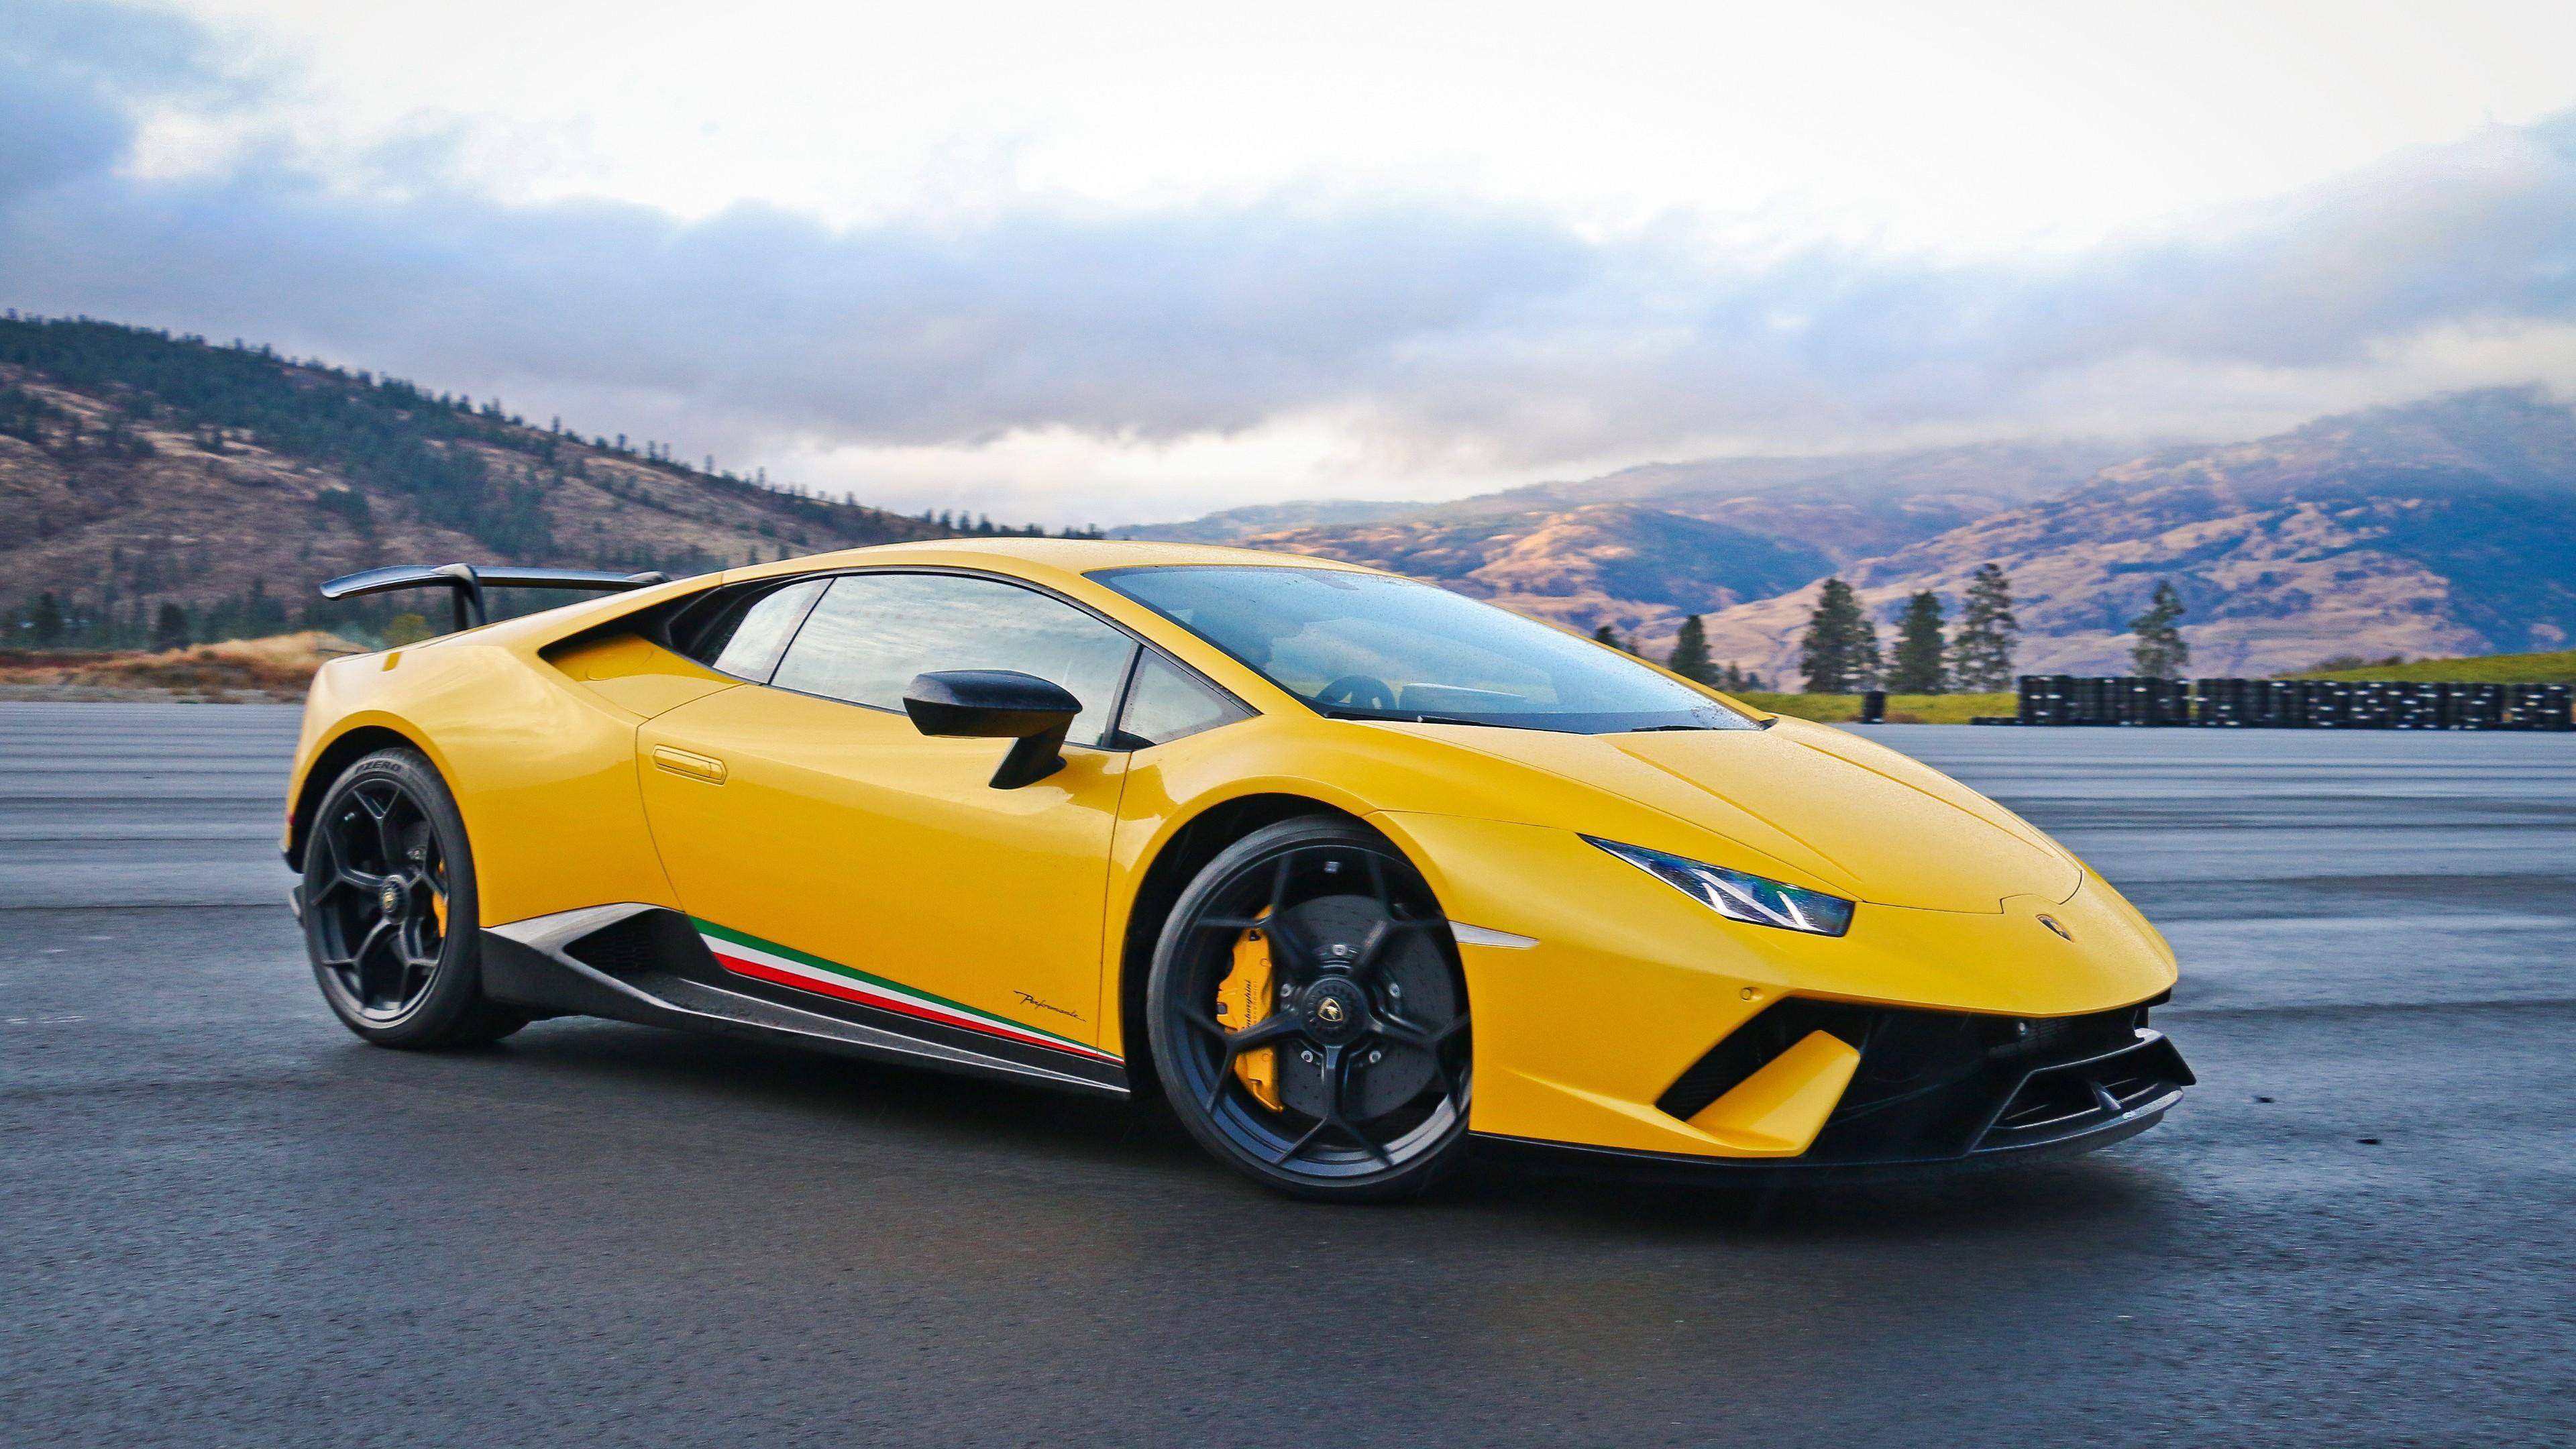 Yellow Lamborghini Huracan 4k Ultrahd Wallpaper Backiee Free